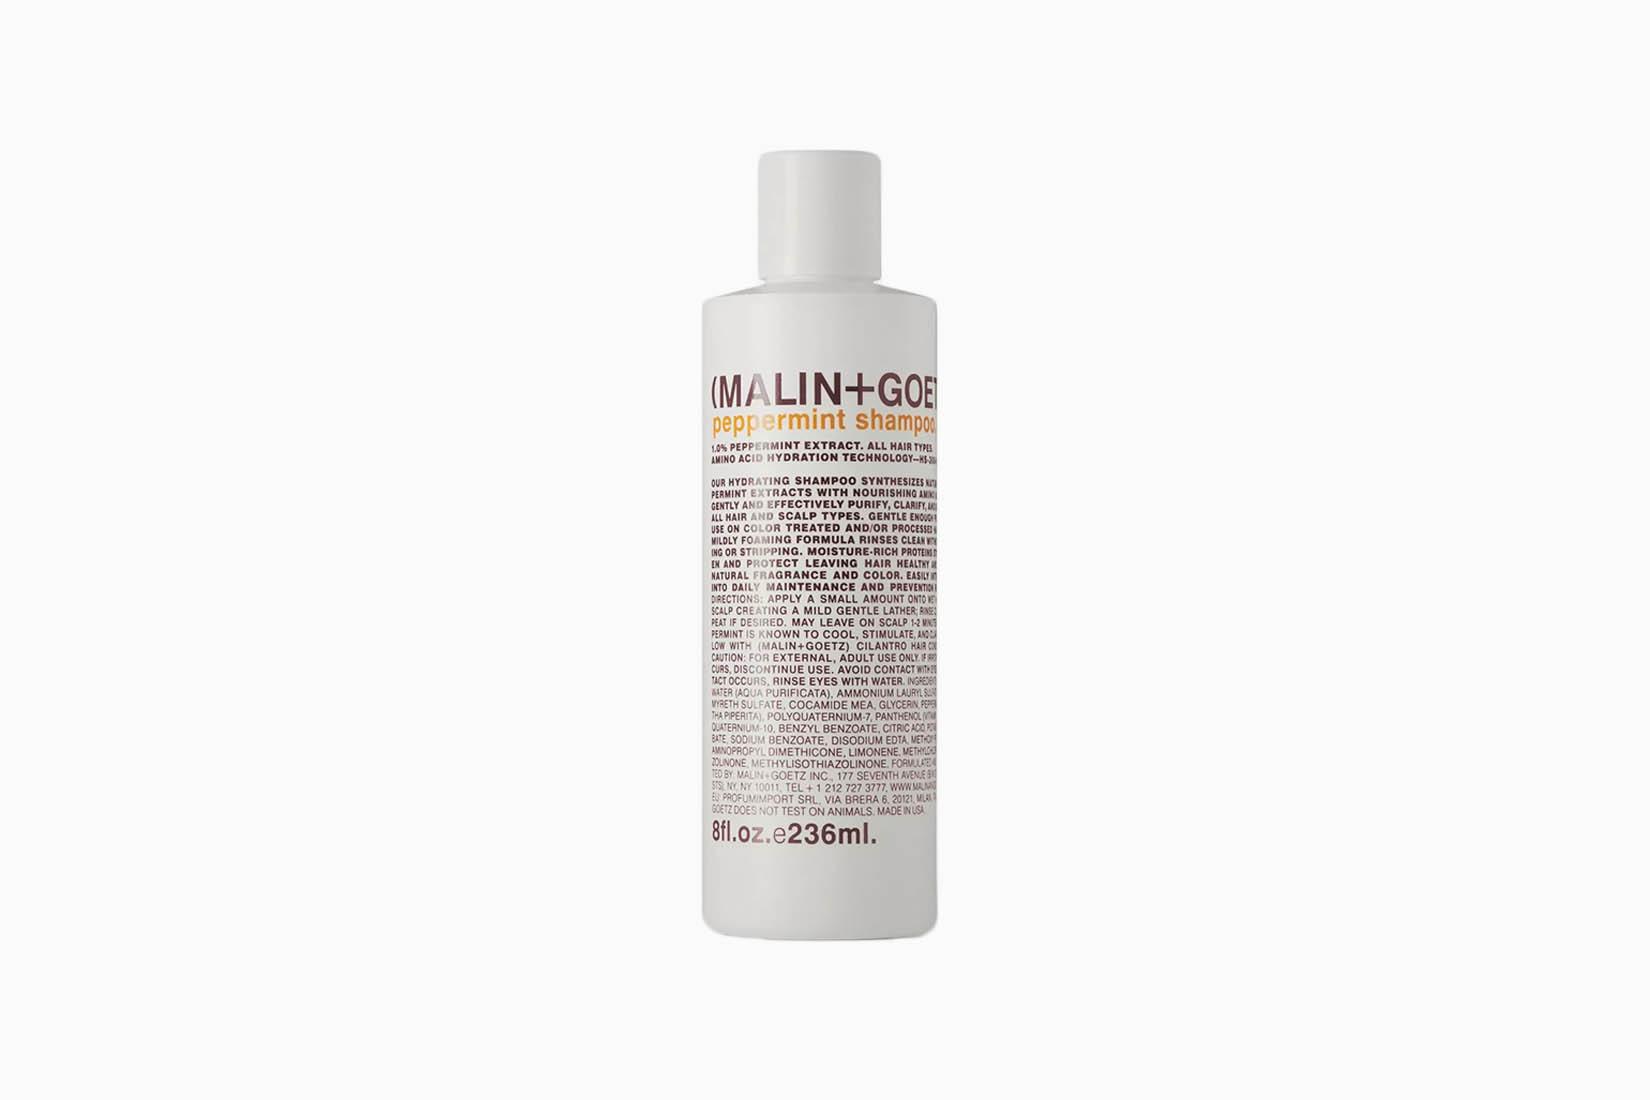 Best Hair Pura Dor Shampoo Men Main Plus Goetz Review - Luxe Digital